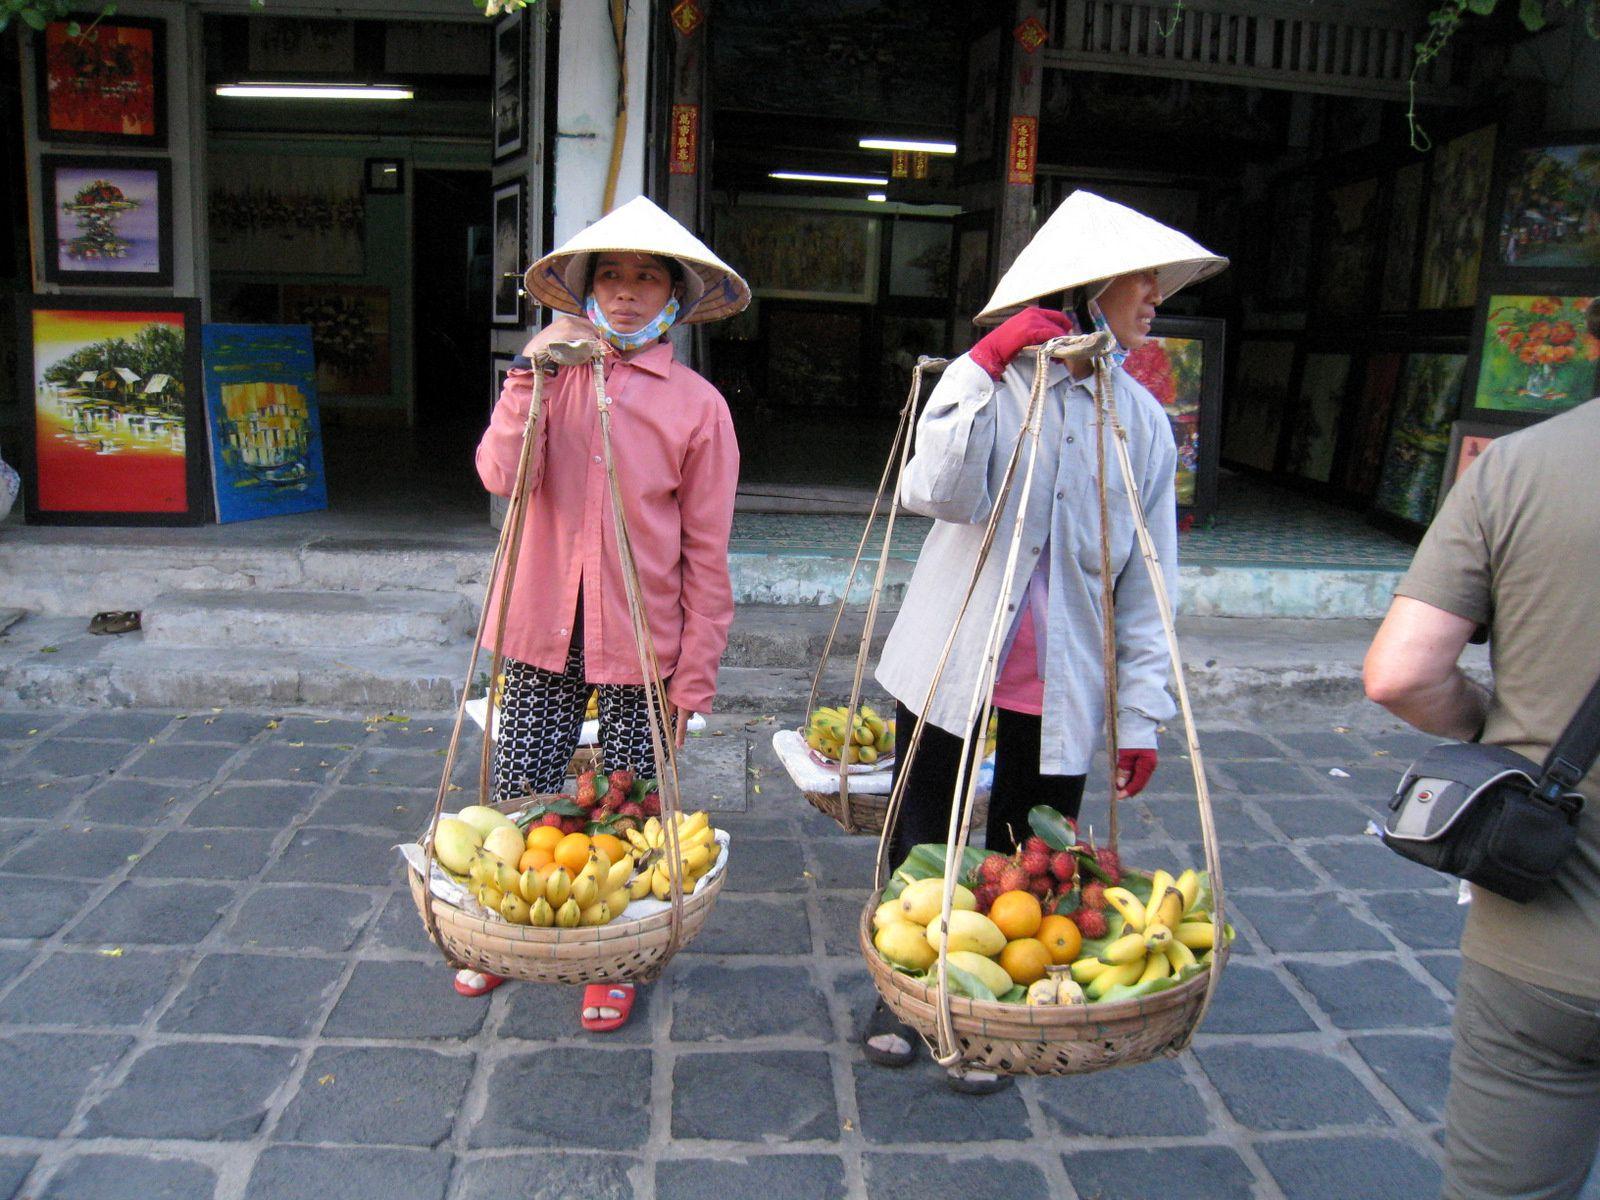 Commerces dans les rues d'Hanoï (Vietnam)